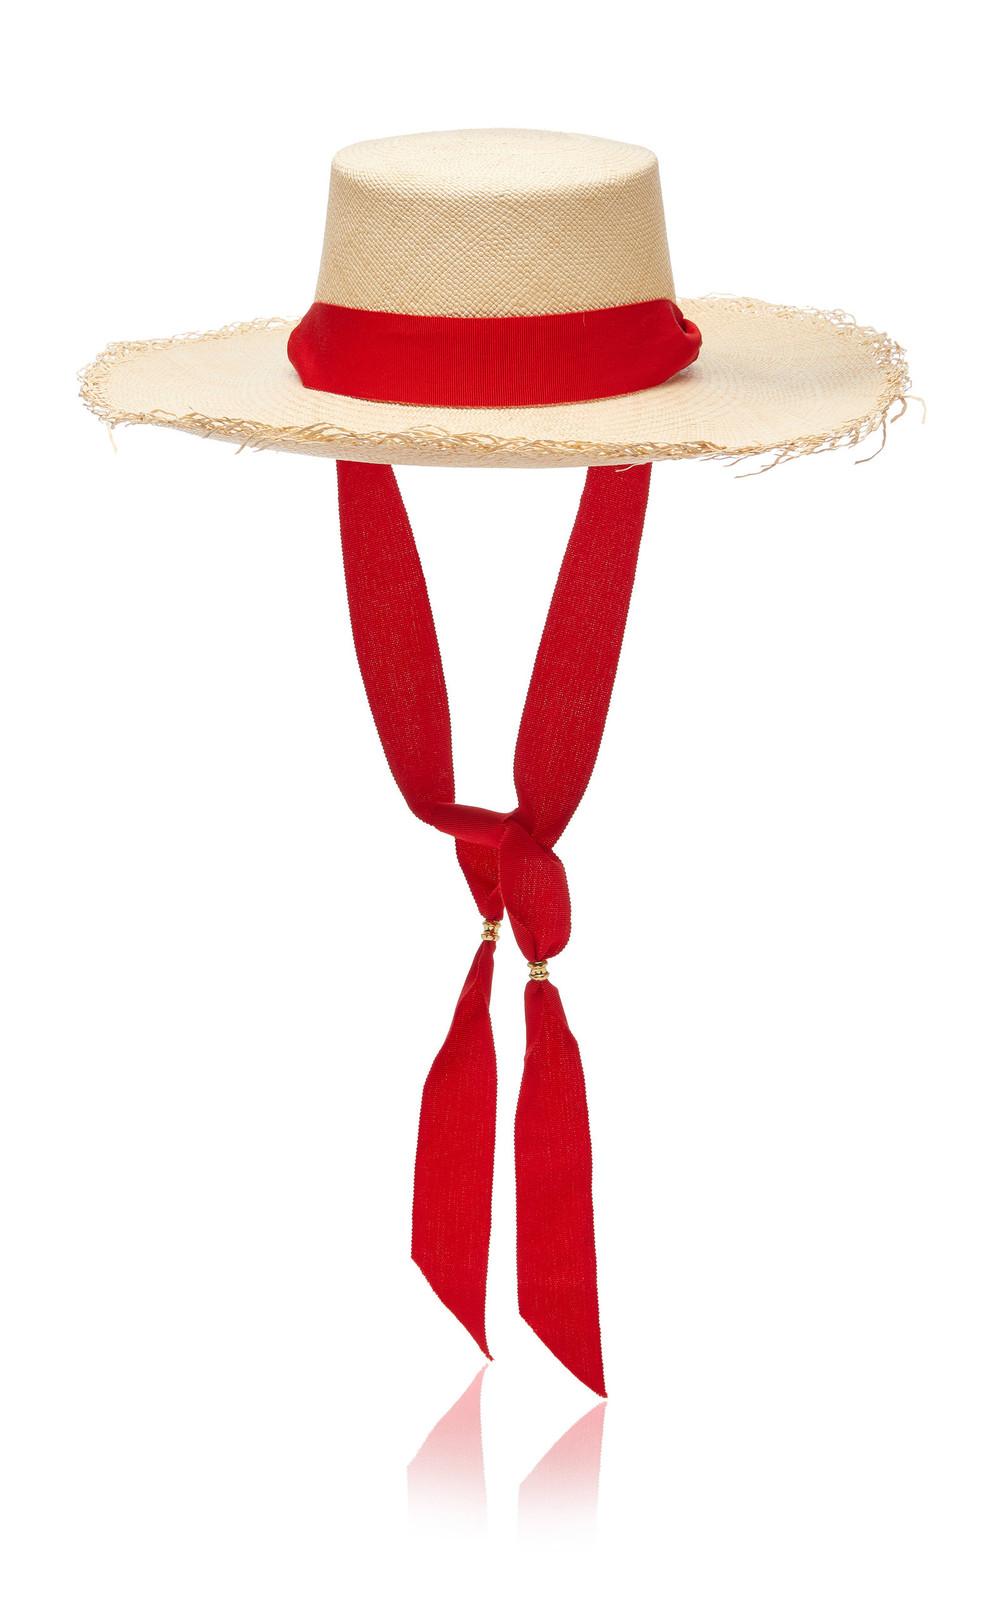 Sensi Studio Frayed Grosgrain-Trimmed Straw Hat in neutral